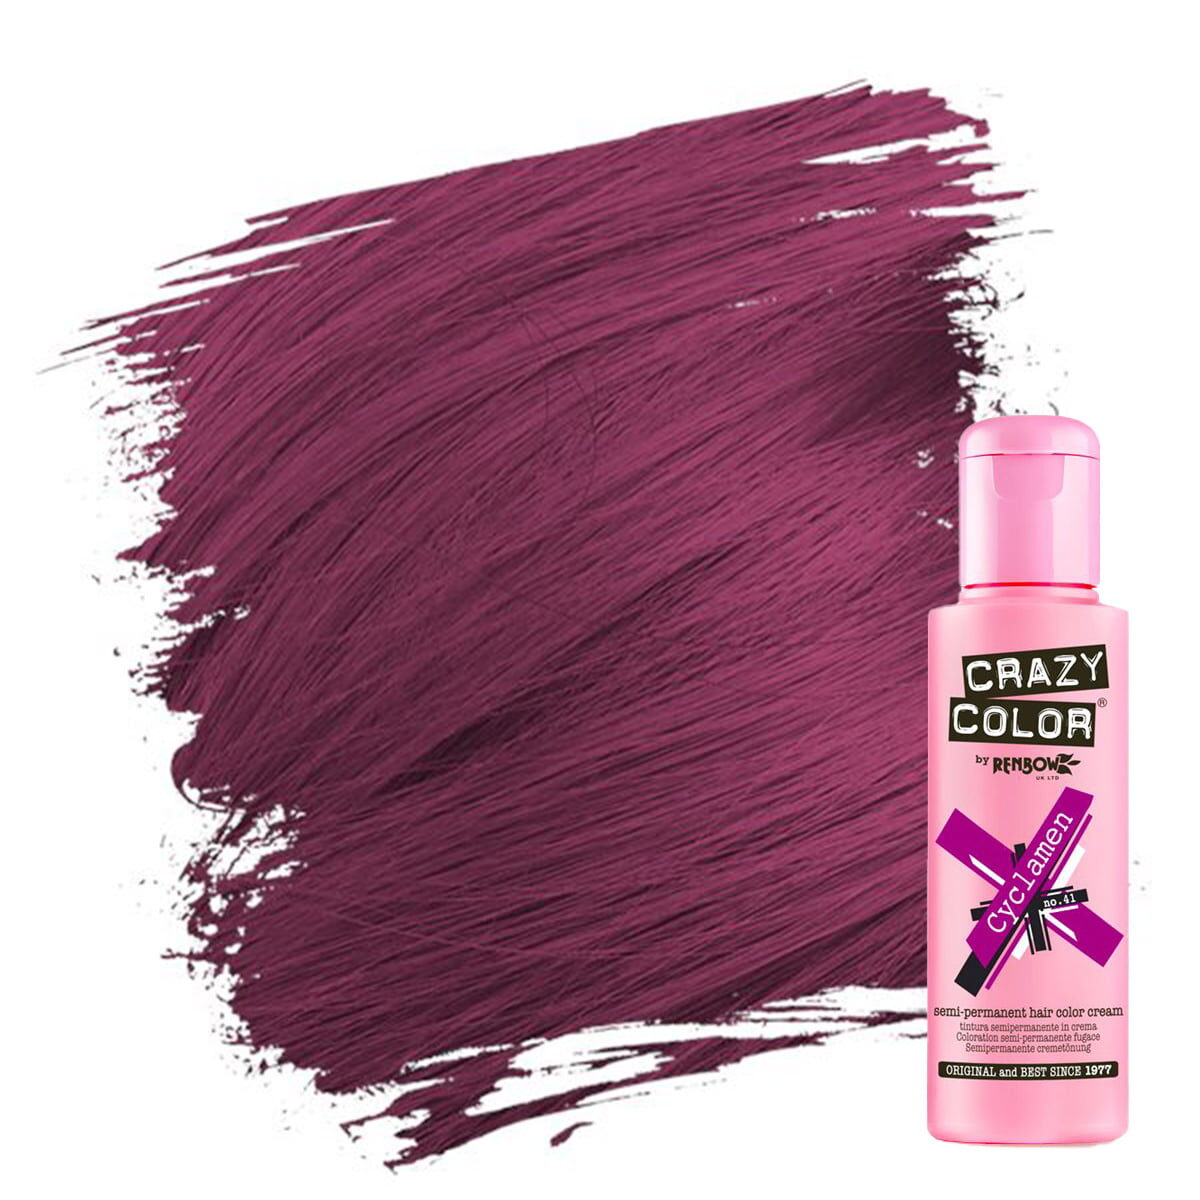 crazy color hårfarger burgunder harfårge cyclamen 002231